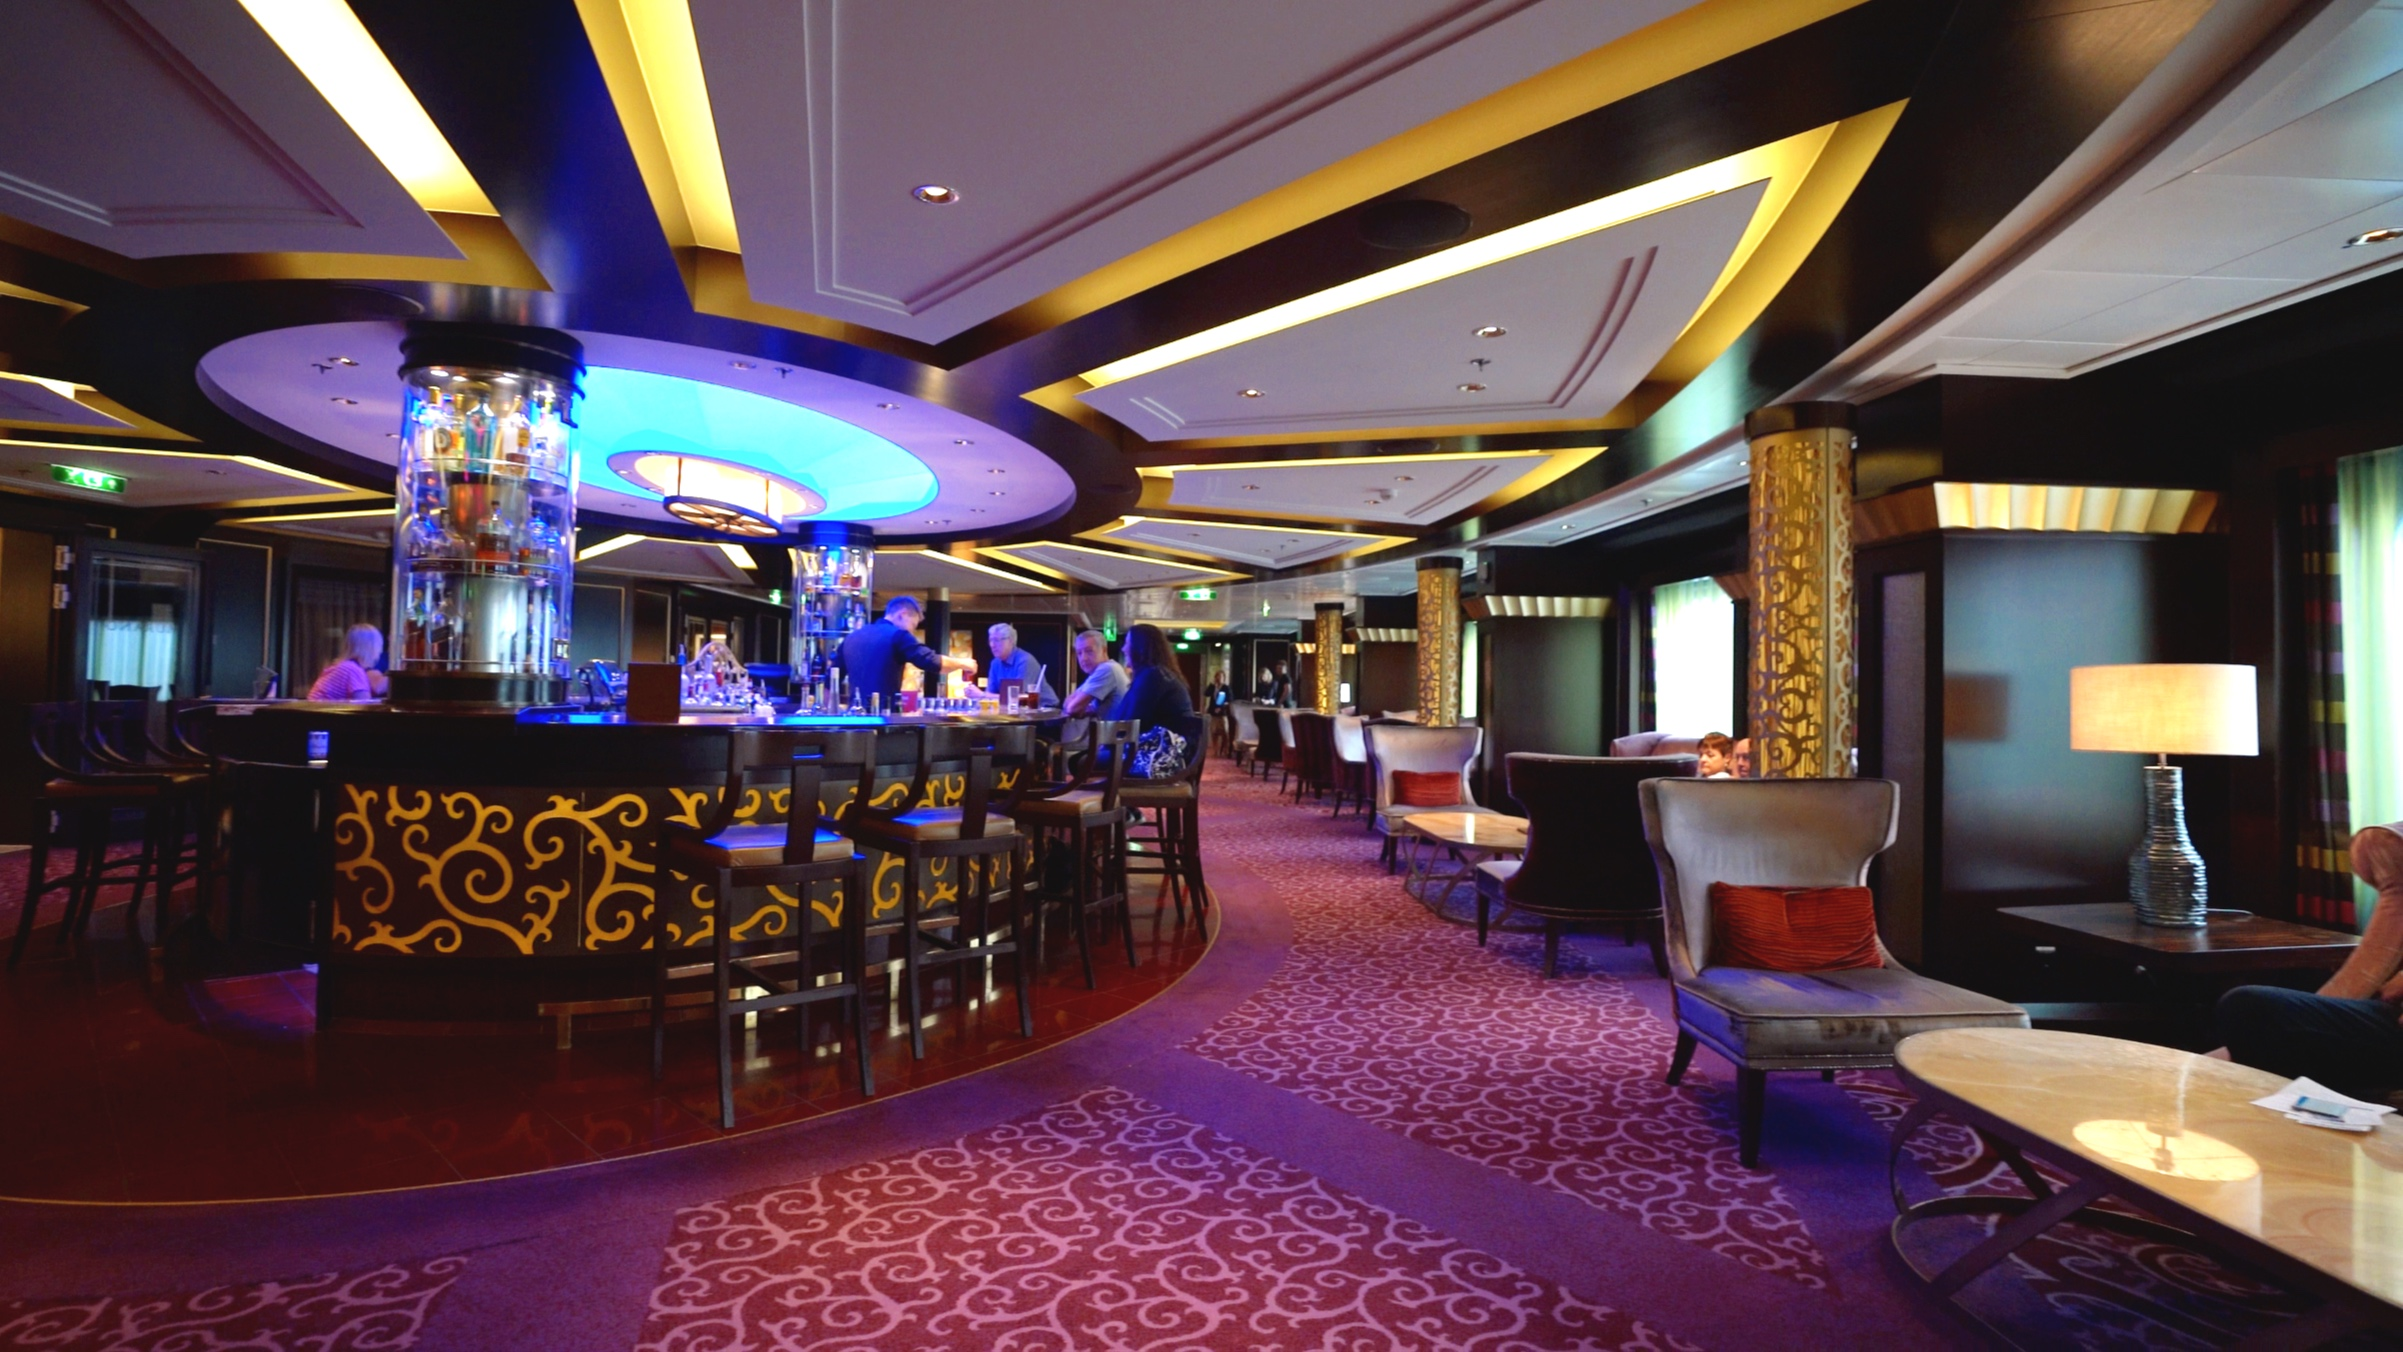 The Ensemble lounge and bar